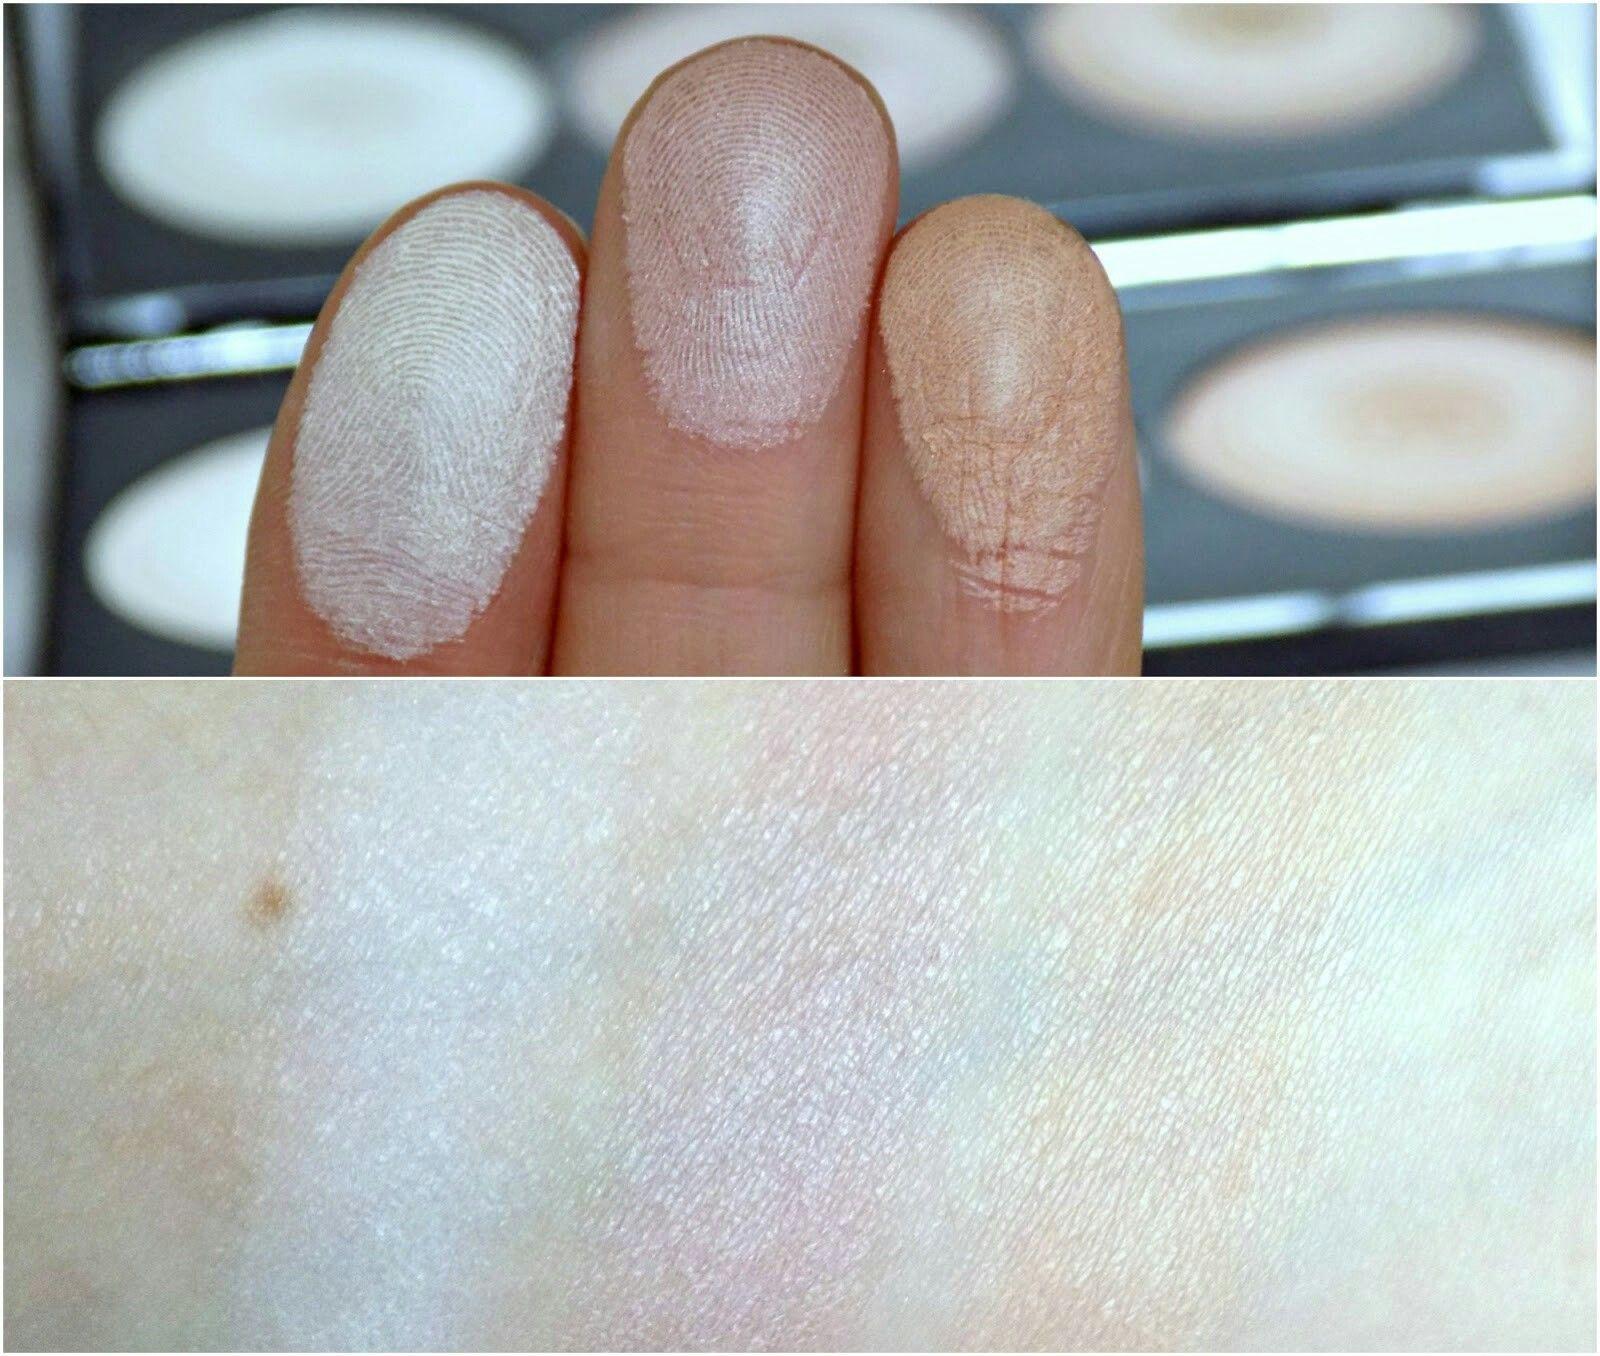 Beyond Radiance Makeup revolution highlighters, Makeup